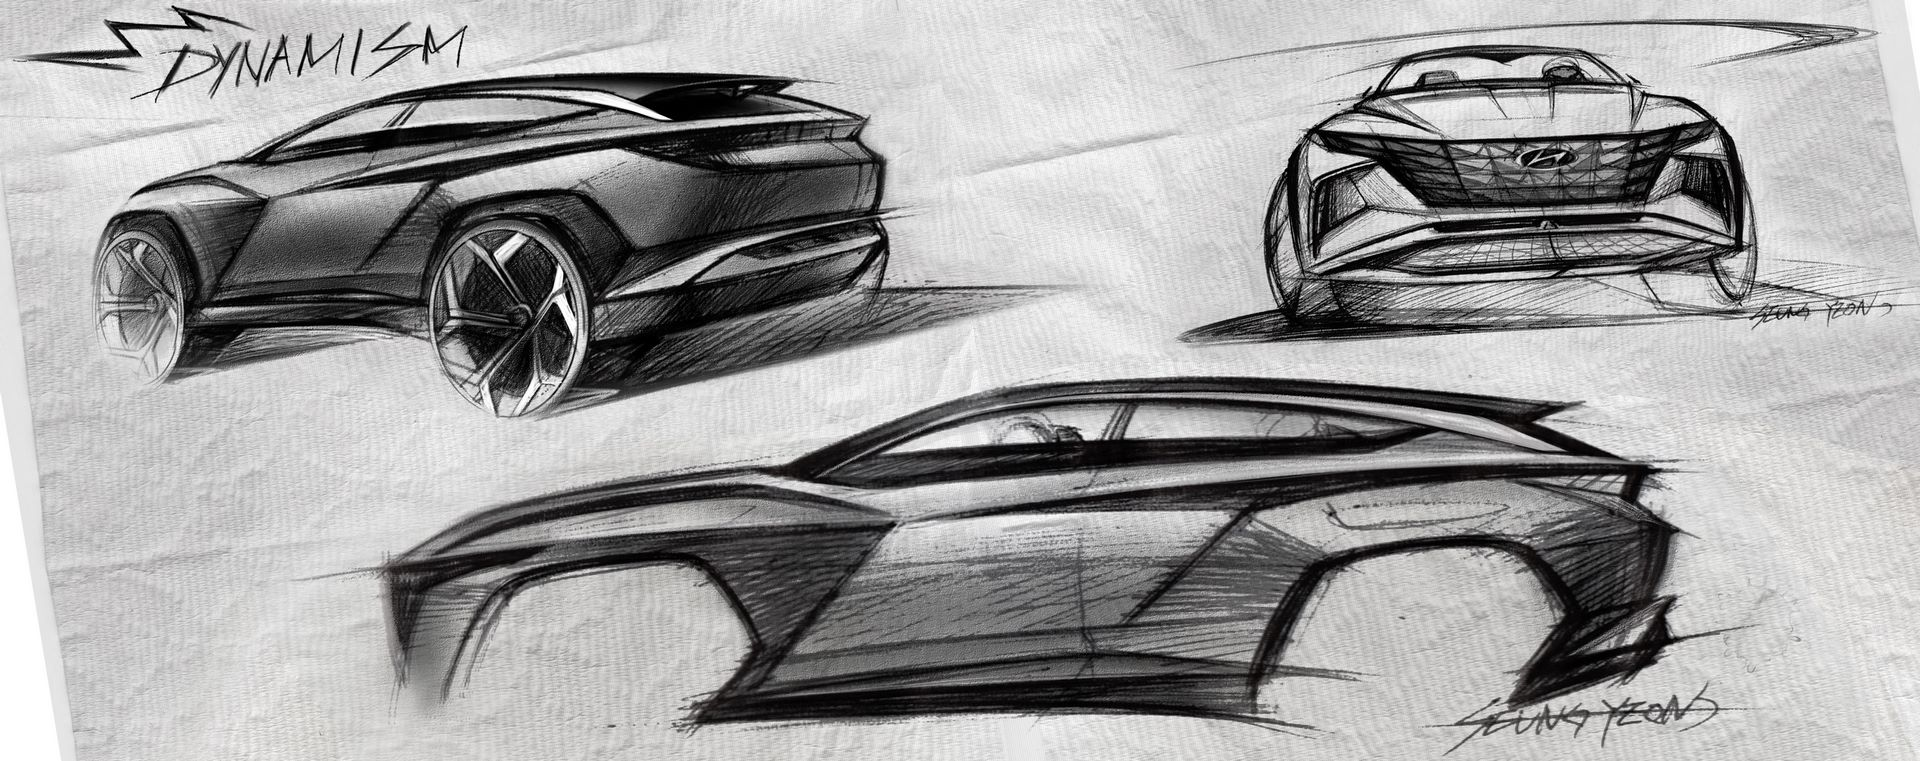 Hyundai-Vision-T-Concept-20